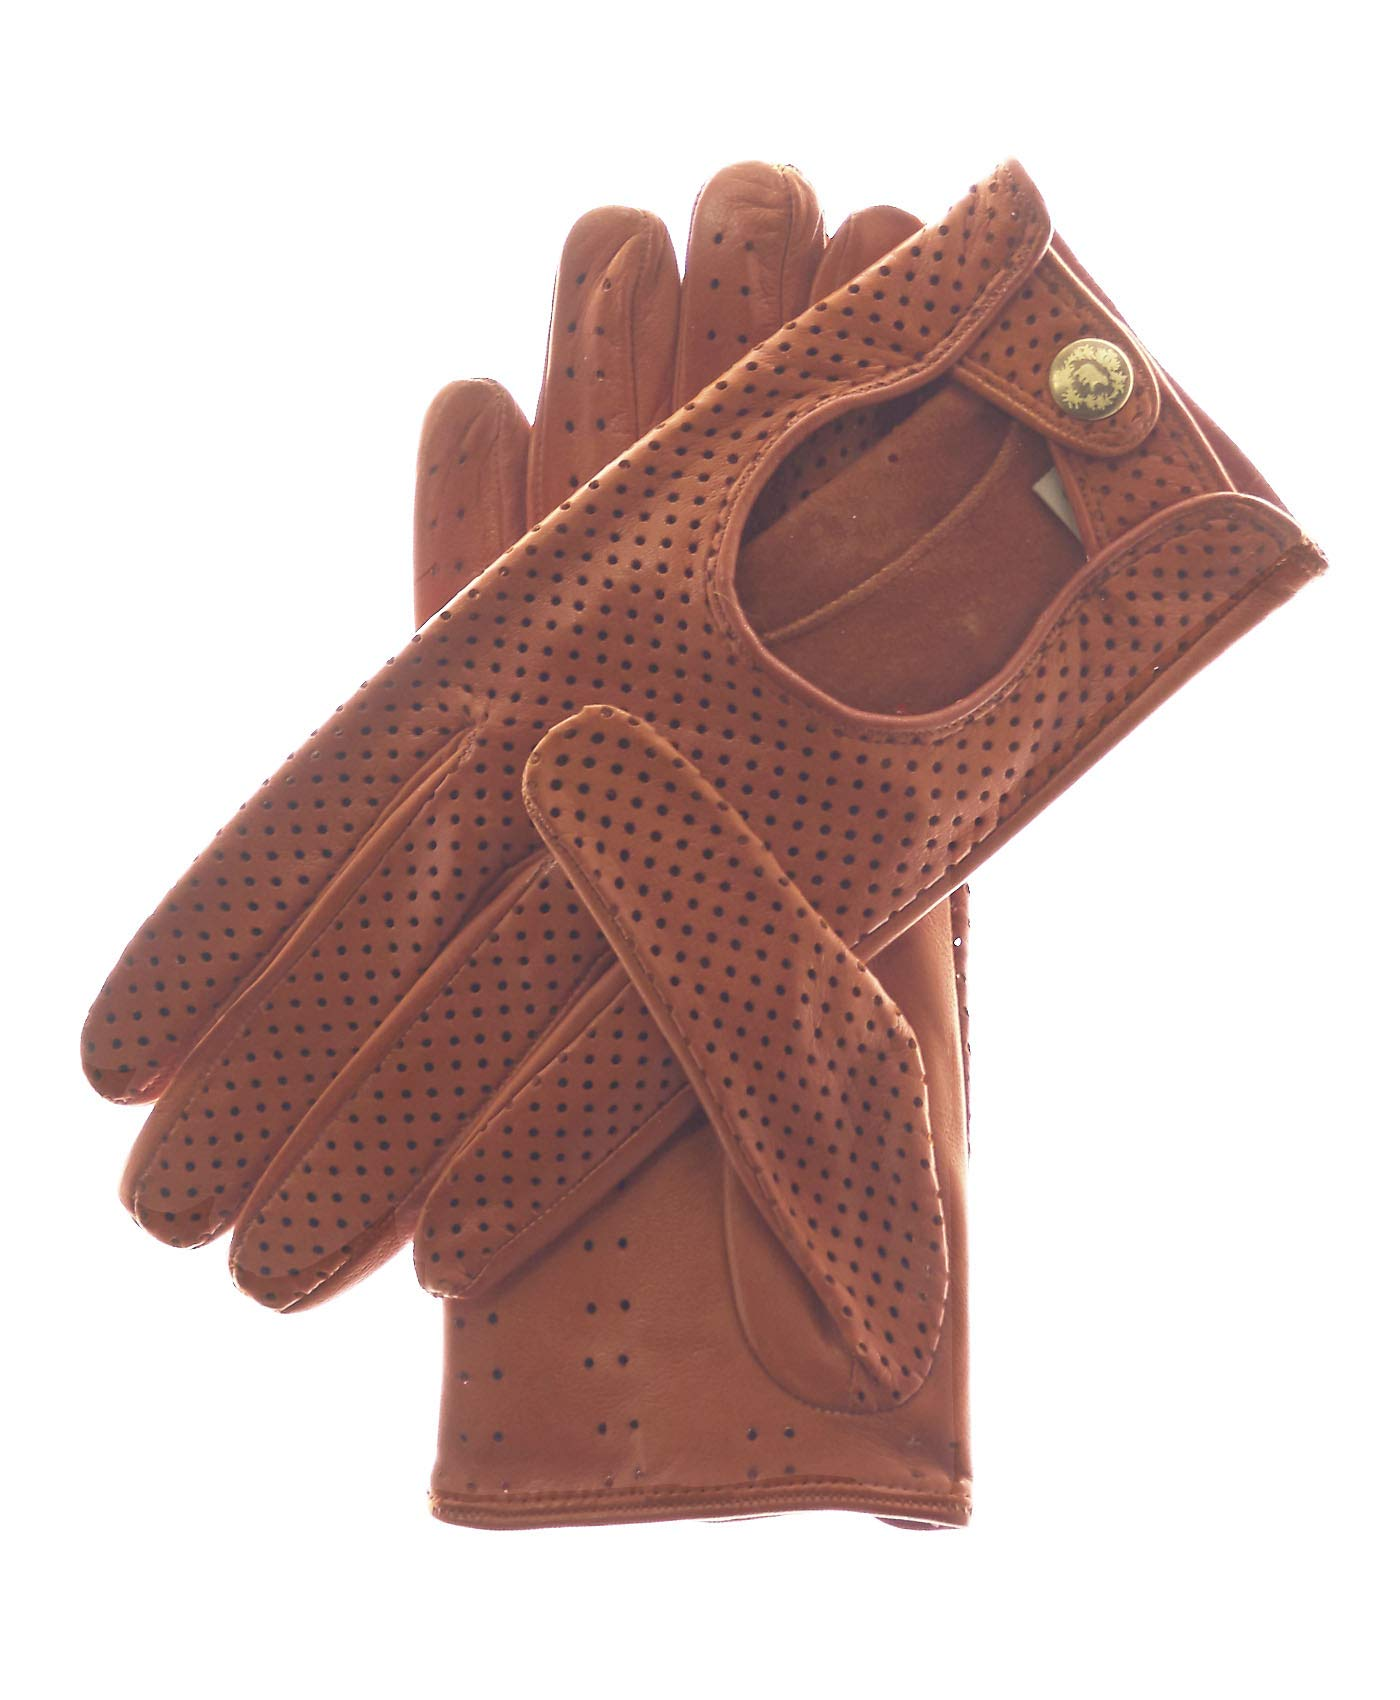 Fratelli Orsini Women's Ventilated Leather Driving Gloves Size 6 1/2 Color Cognac